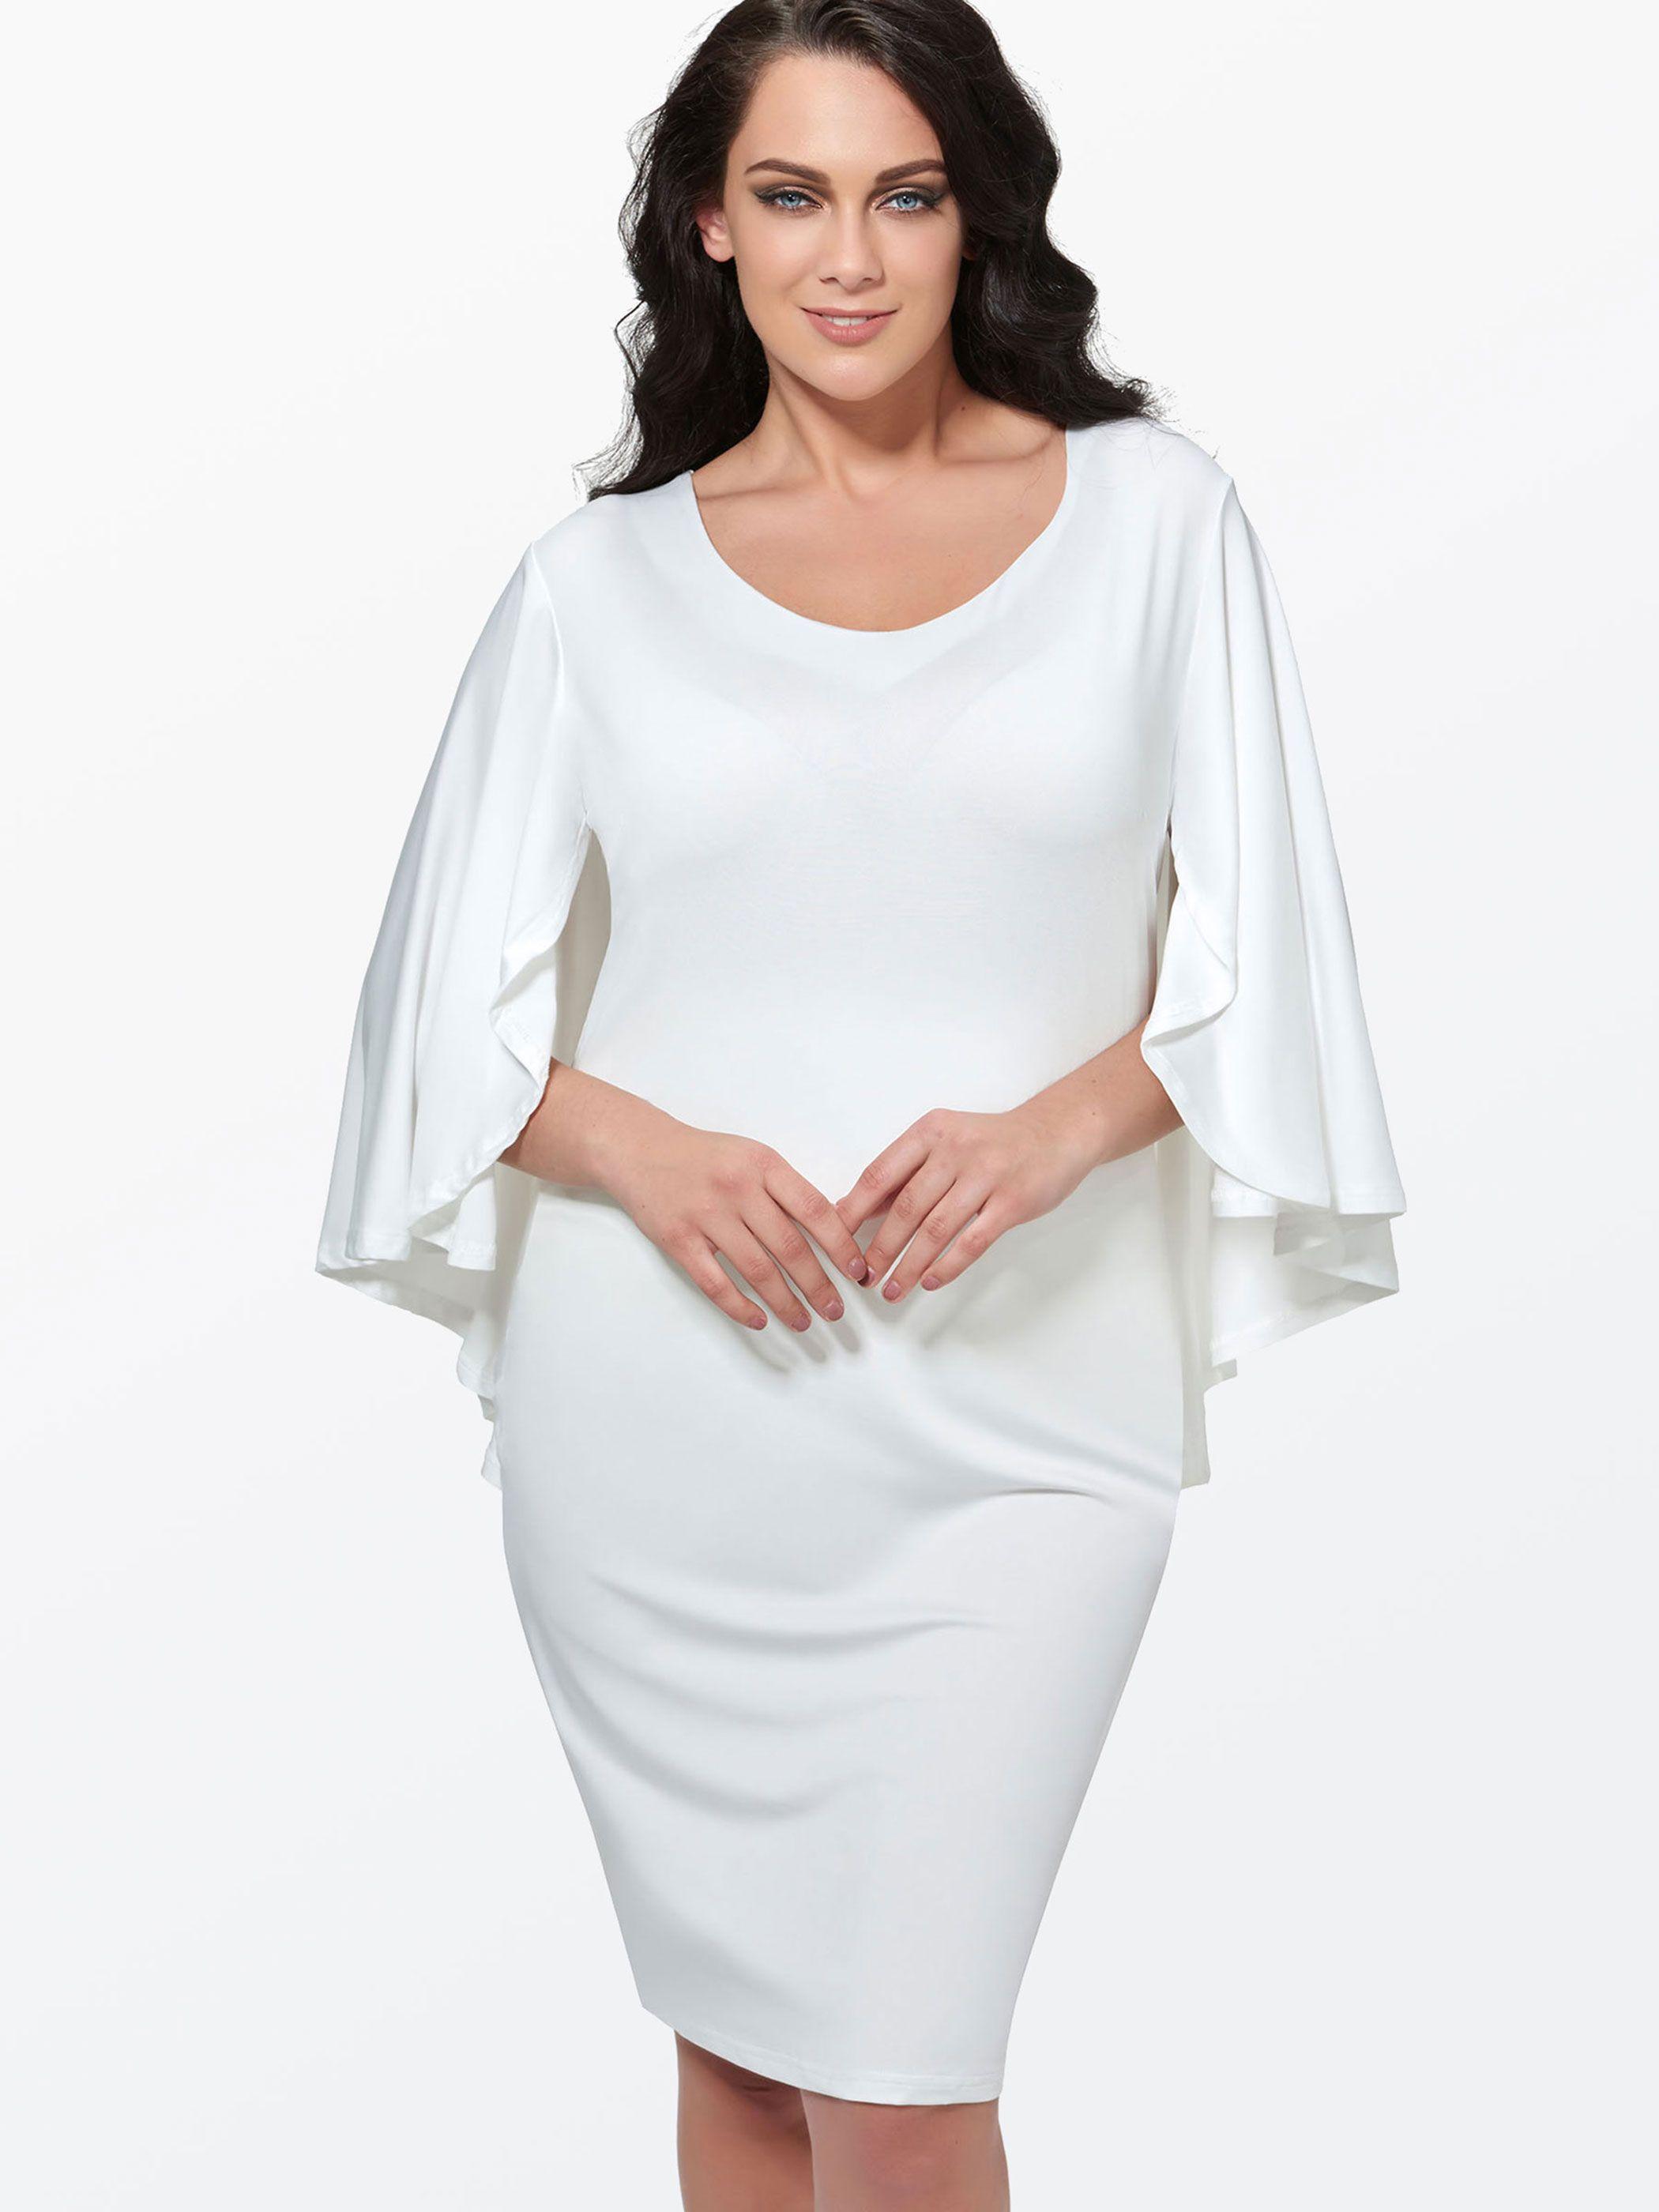 White Open Back Women S Plus Size Dress Plus Size Bodycon Dresses Women Bodycon Dress White Dresses For Women [ 2800 x 2100 Pixel ]